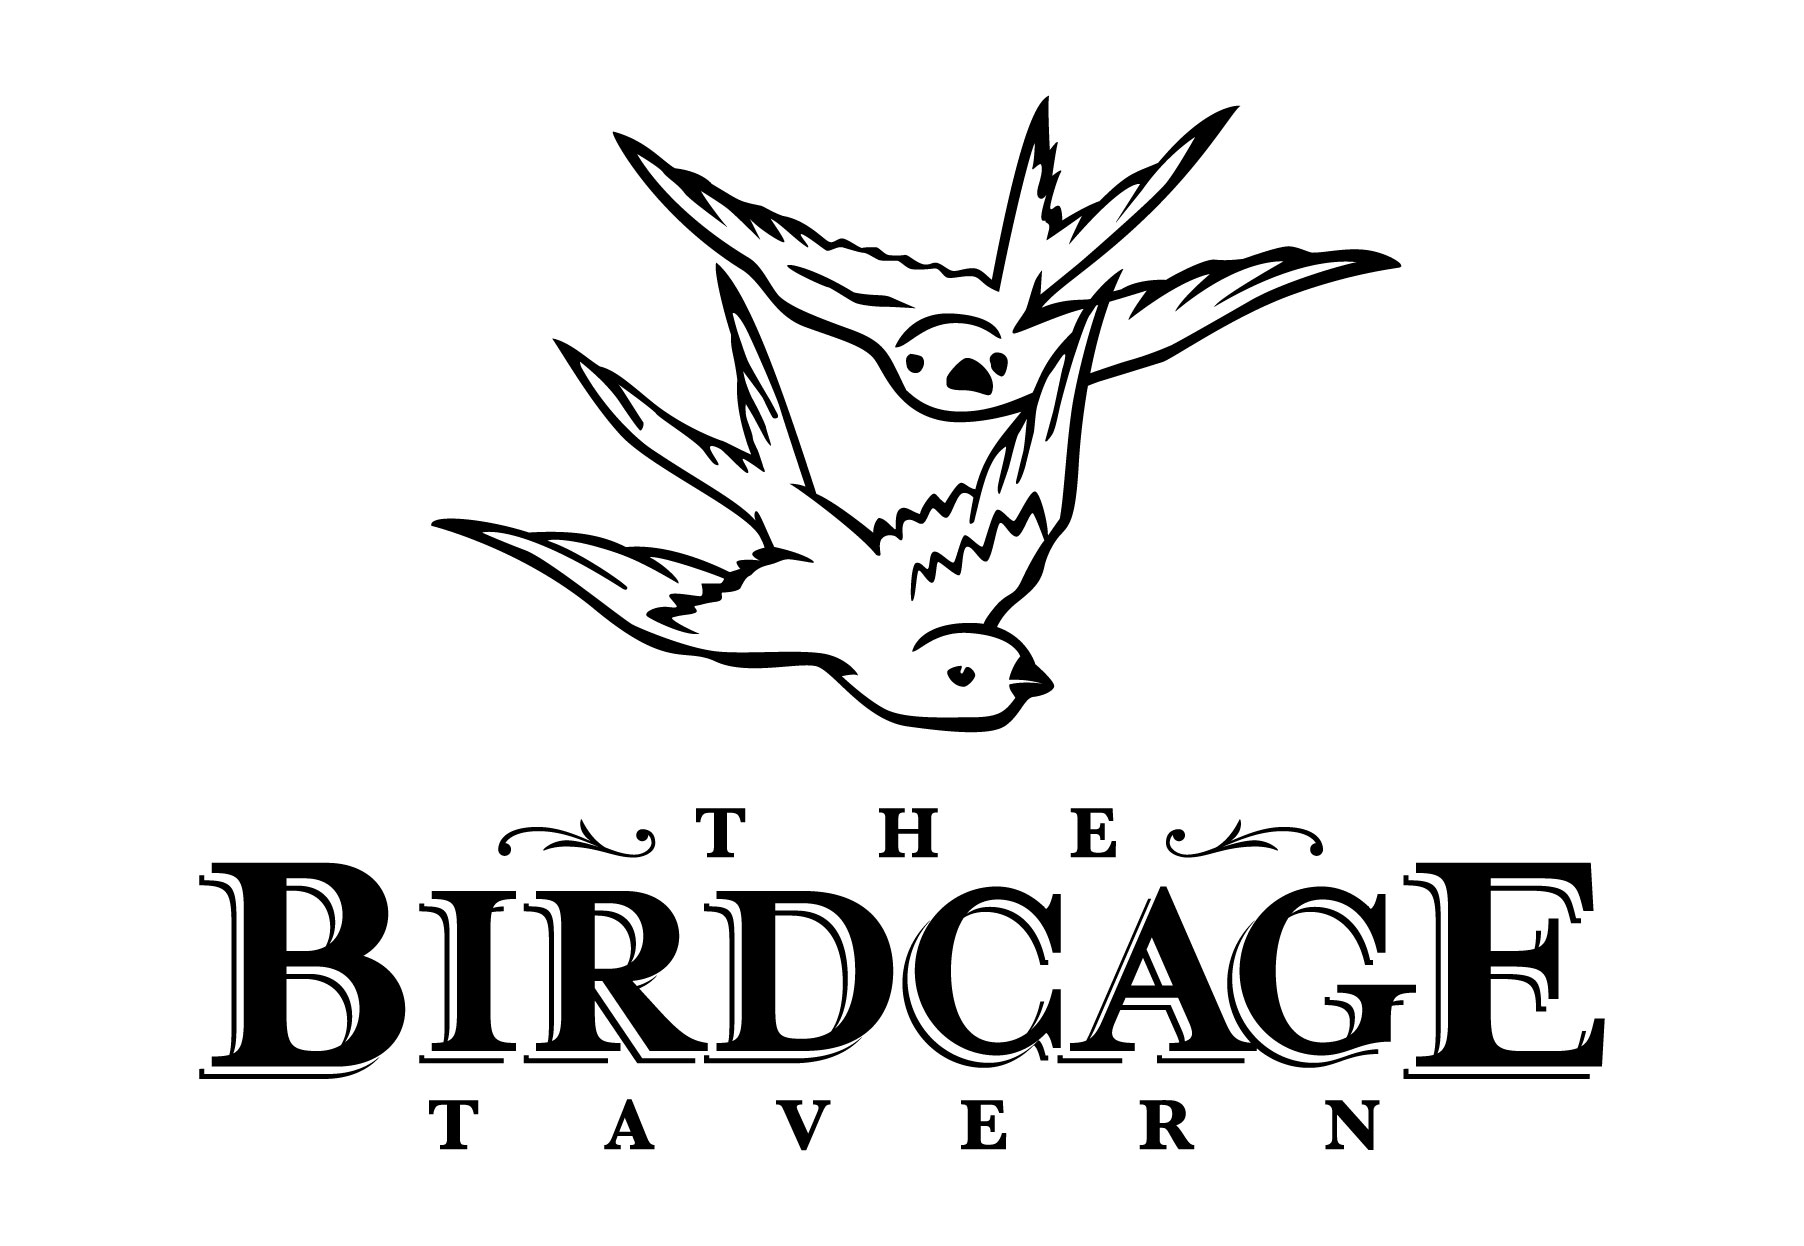 The_Birdcage_Tavern-Logo_1.jpg